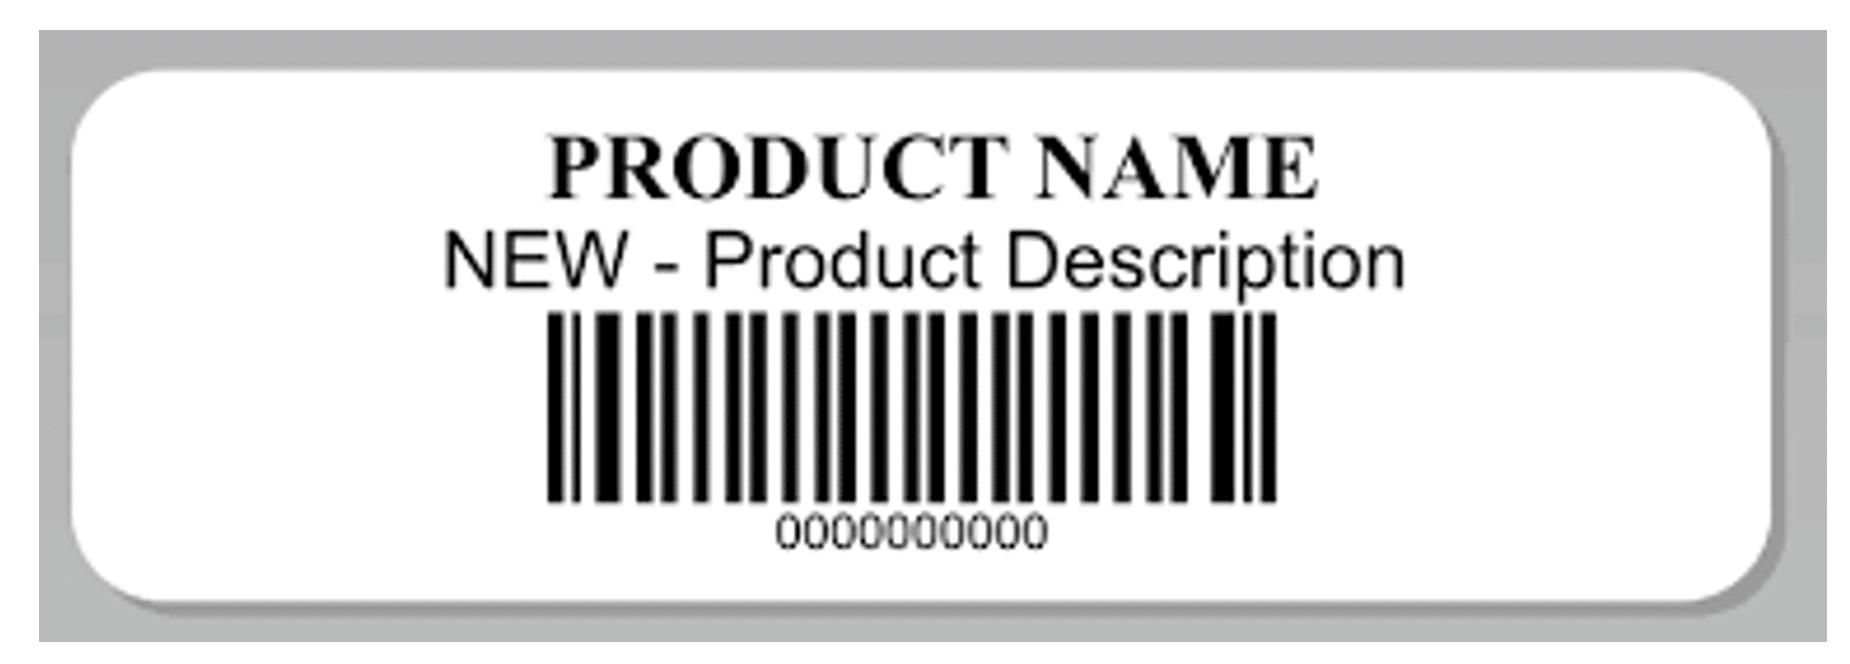 Amazon shipment label example FBA